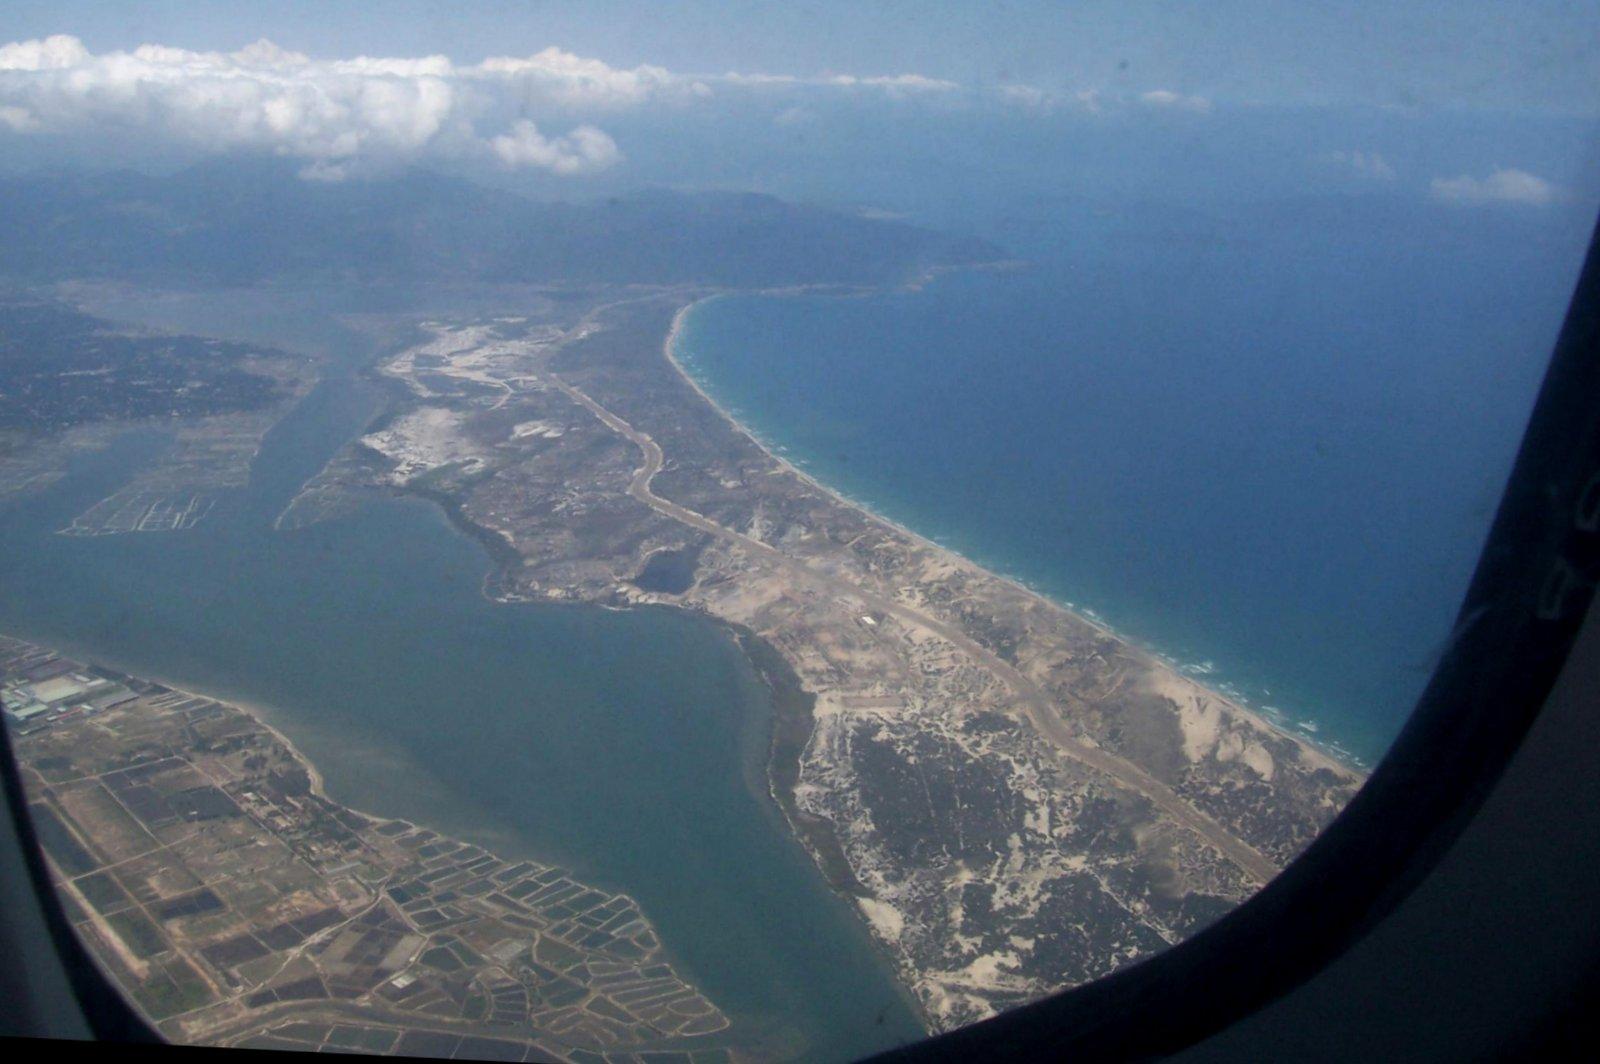 Anflug auf Nha Trang